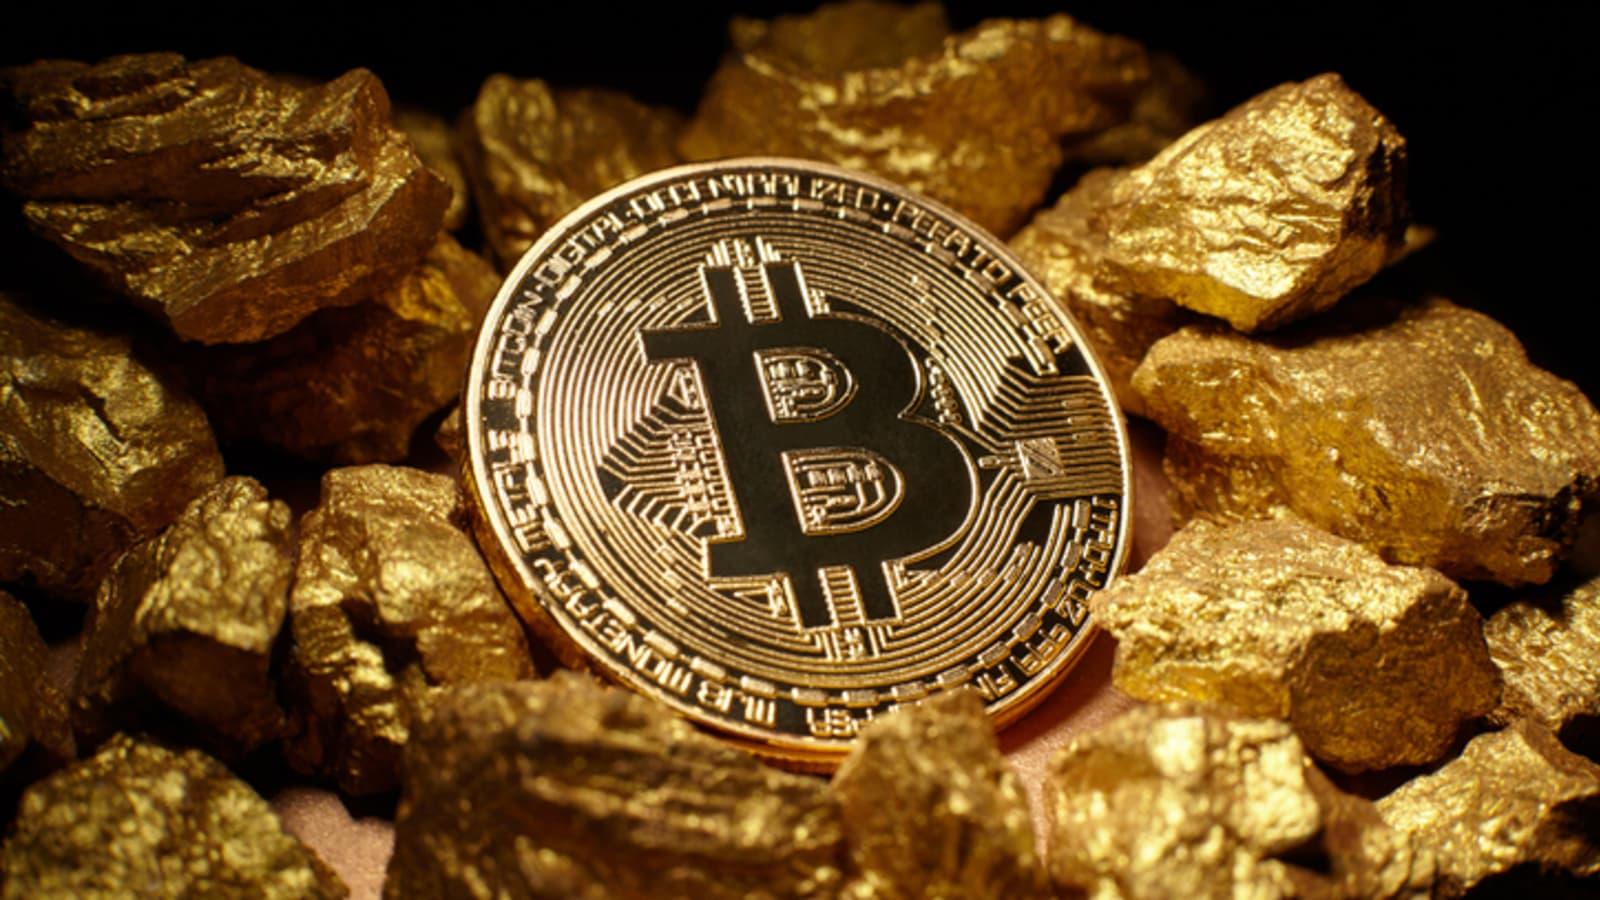 bitcoin prognozės 2021 bitcoin welcus premija nėra indėlių